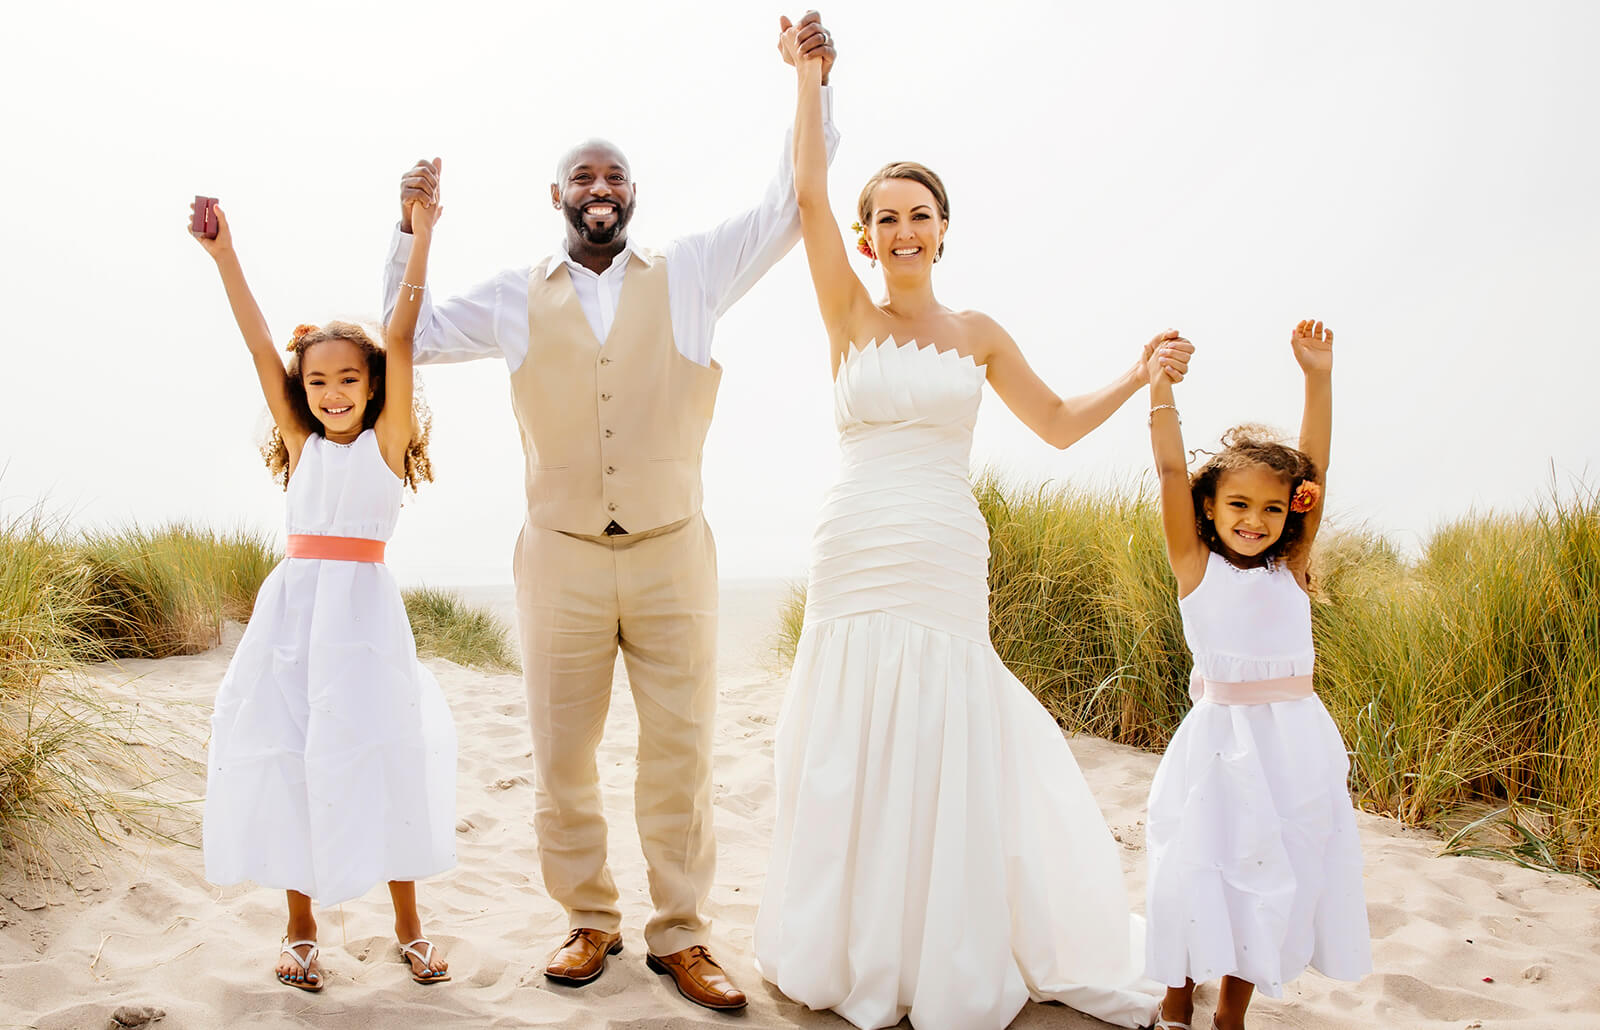 bodas-incluyendo-ninos.jpg